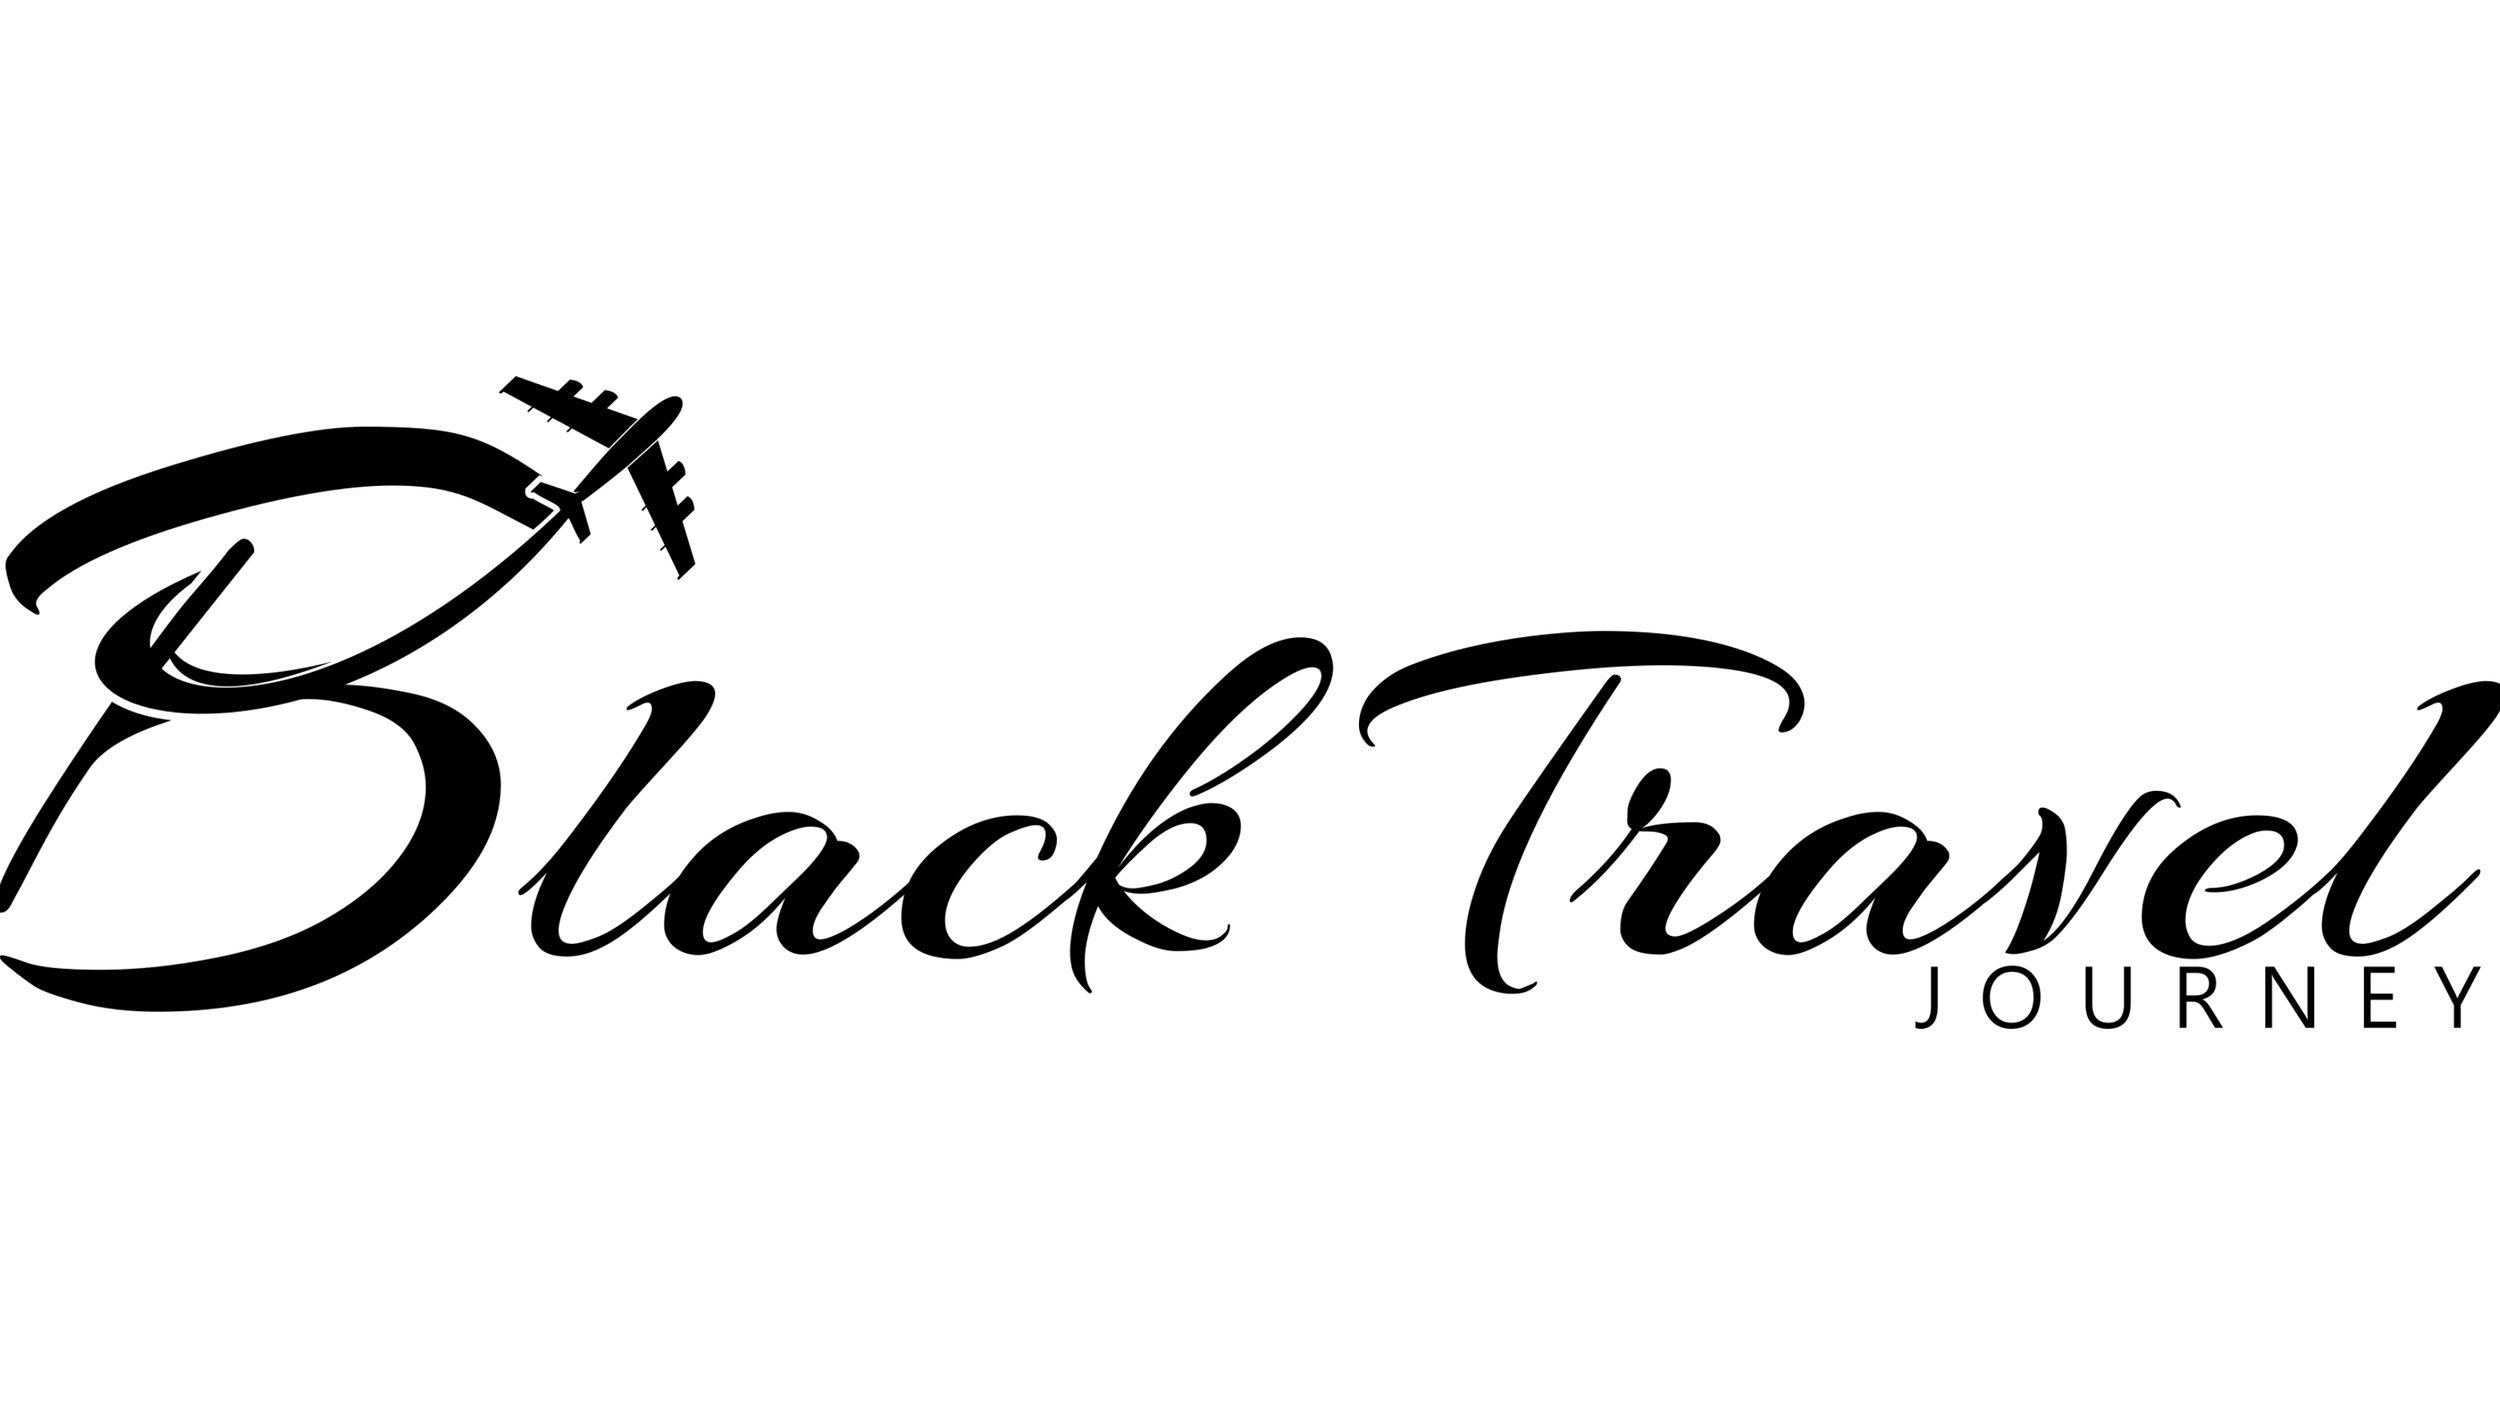 Black travel journey Queen Adwoa's Closet.jpg